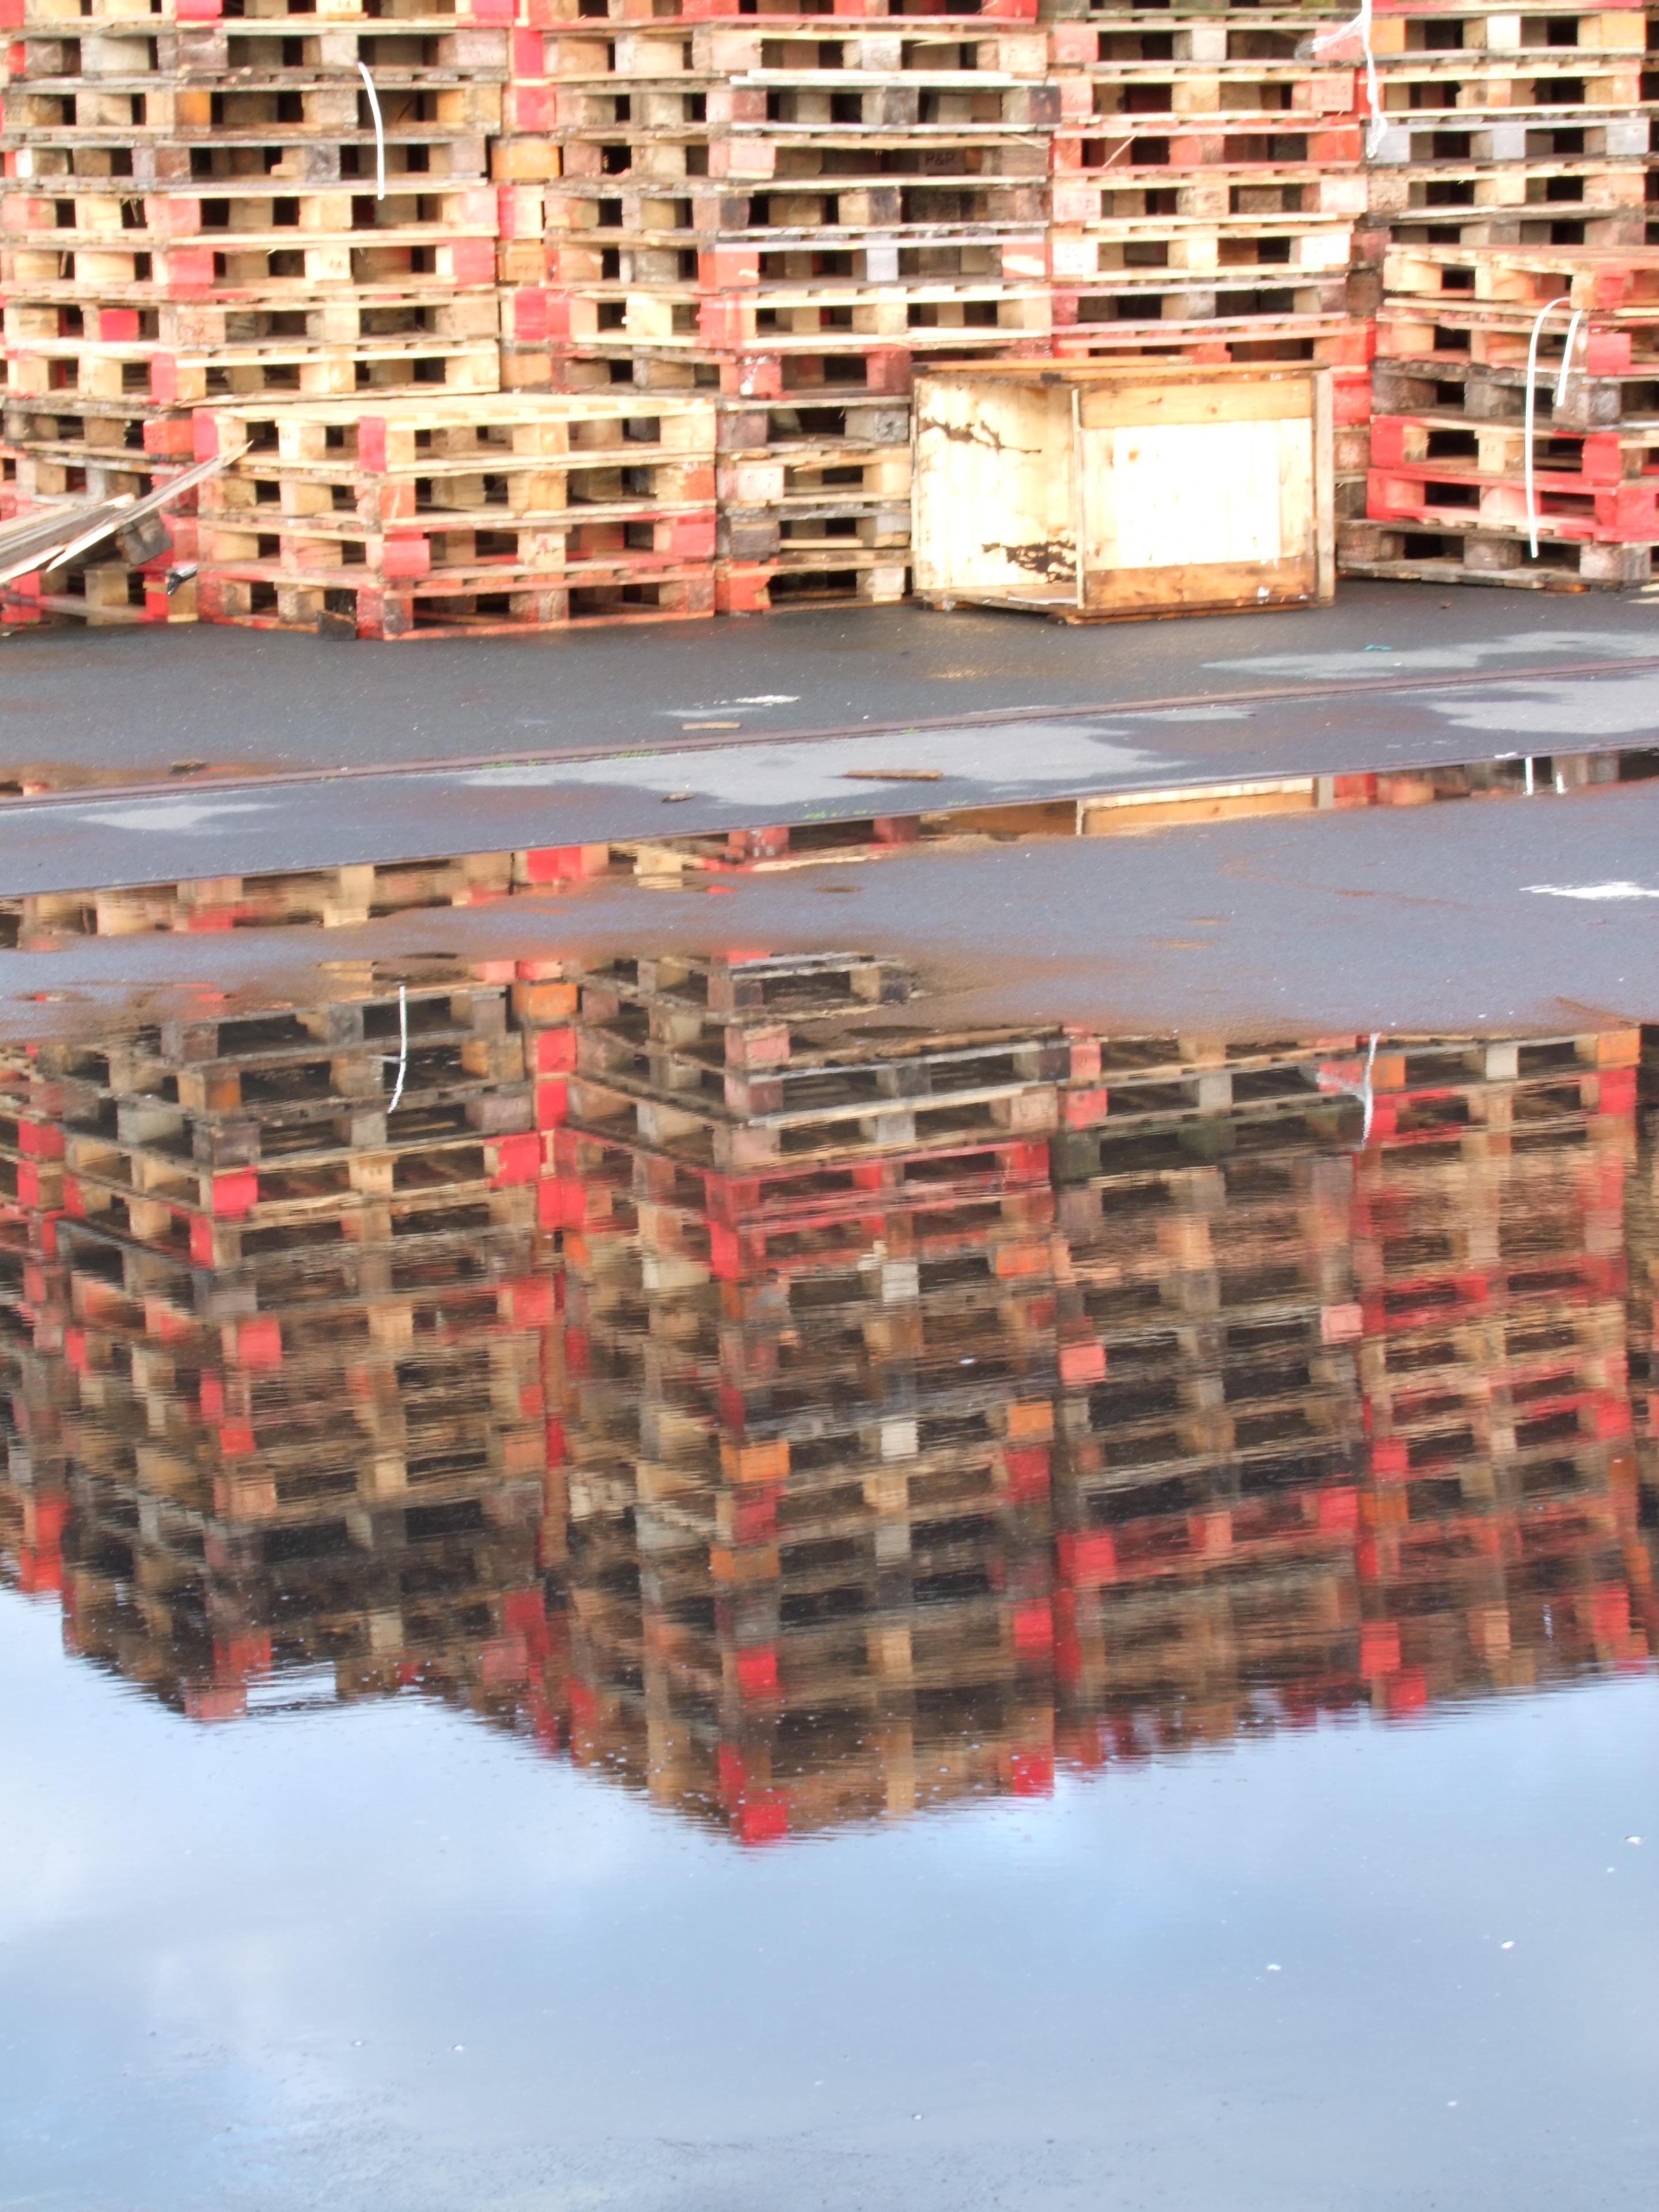 madera pared rojo charco color industria mueble art diseo palets reflejando paletas euro de ventana